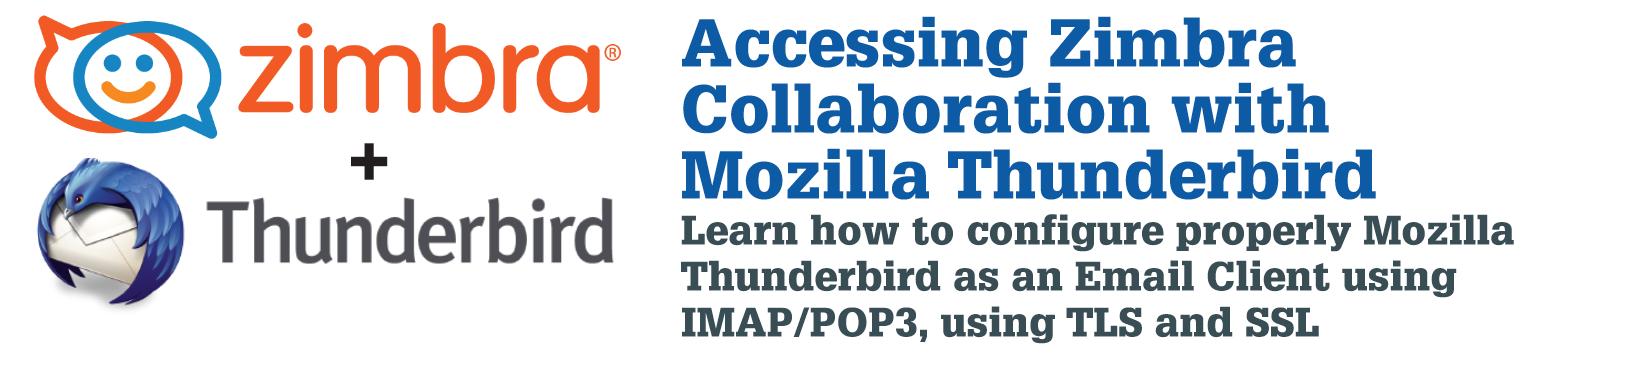 Thunderbird-imap-banner.png